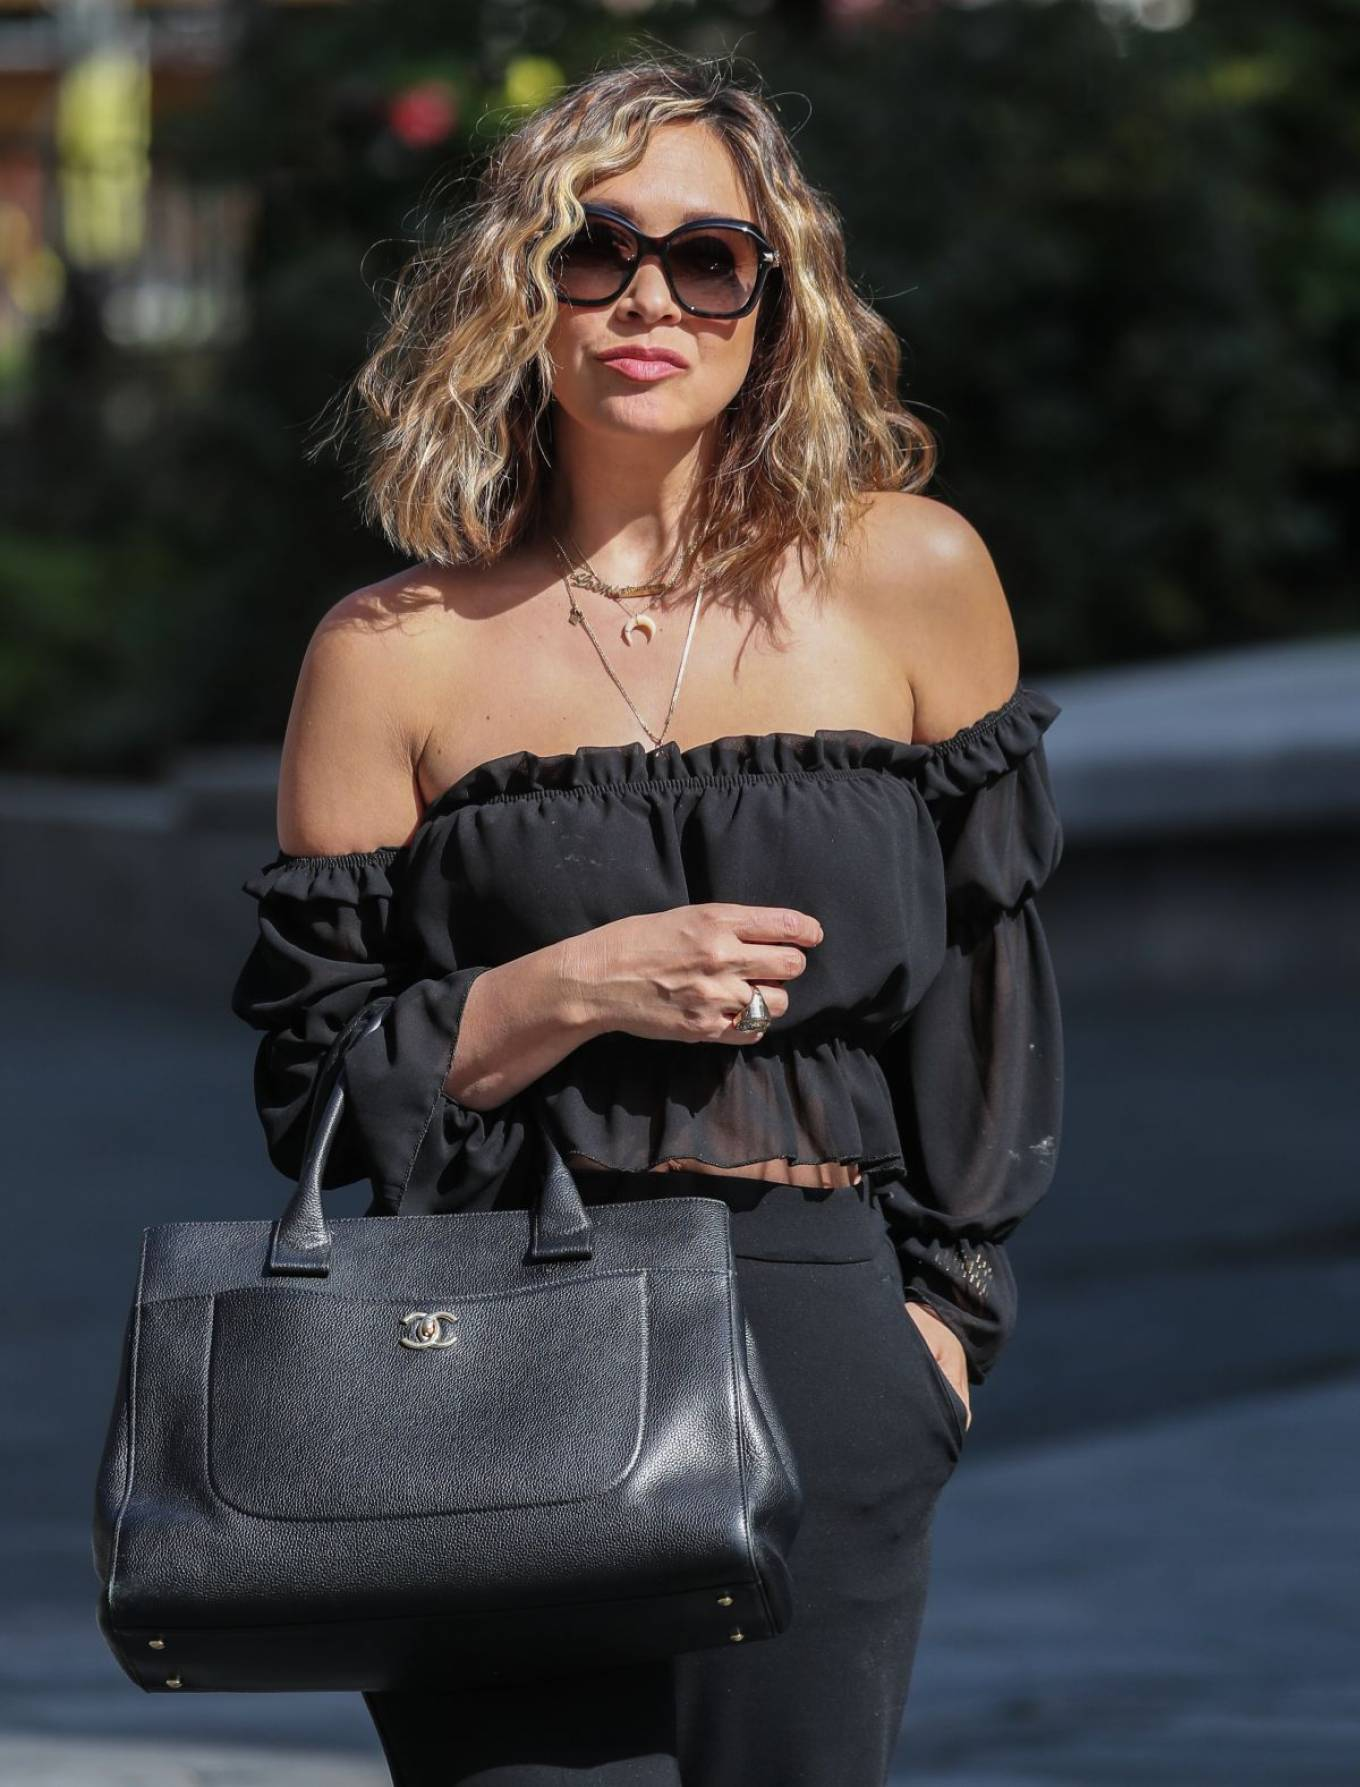 Myleene Klass - Looks classy while arriving at Global Studios in London